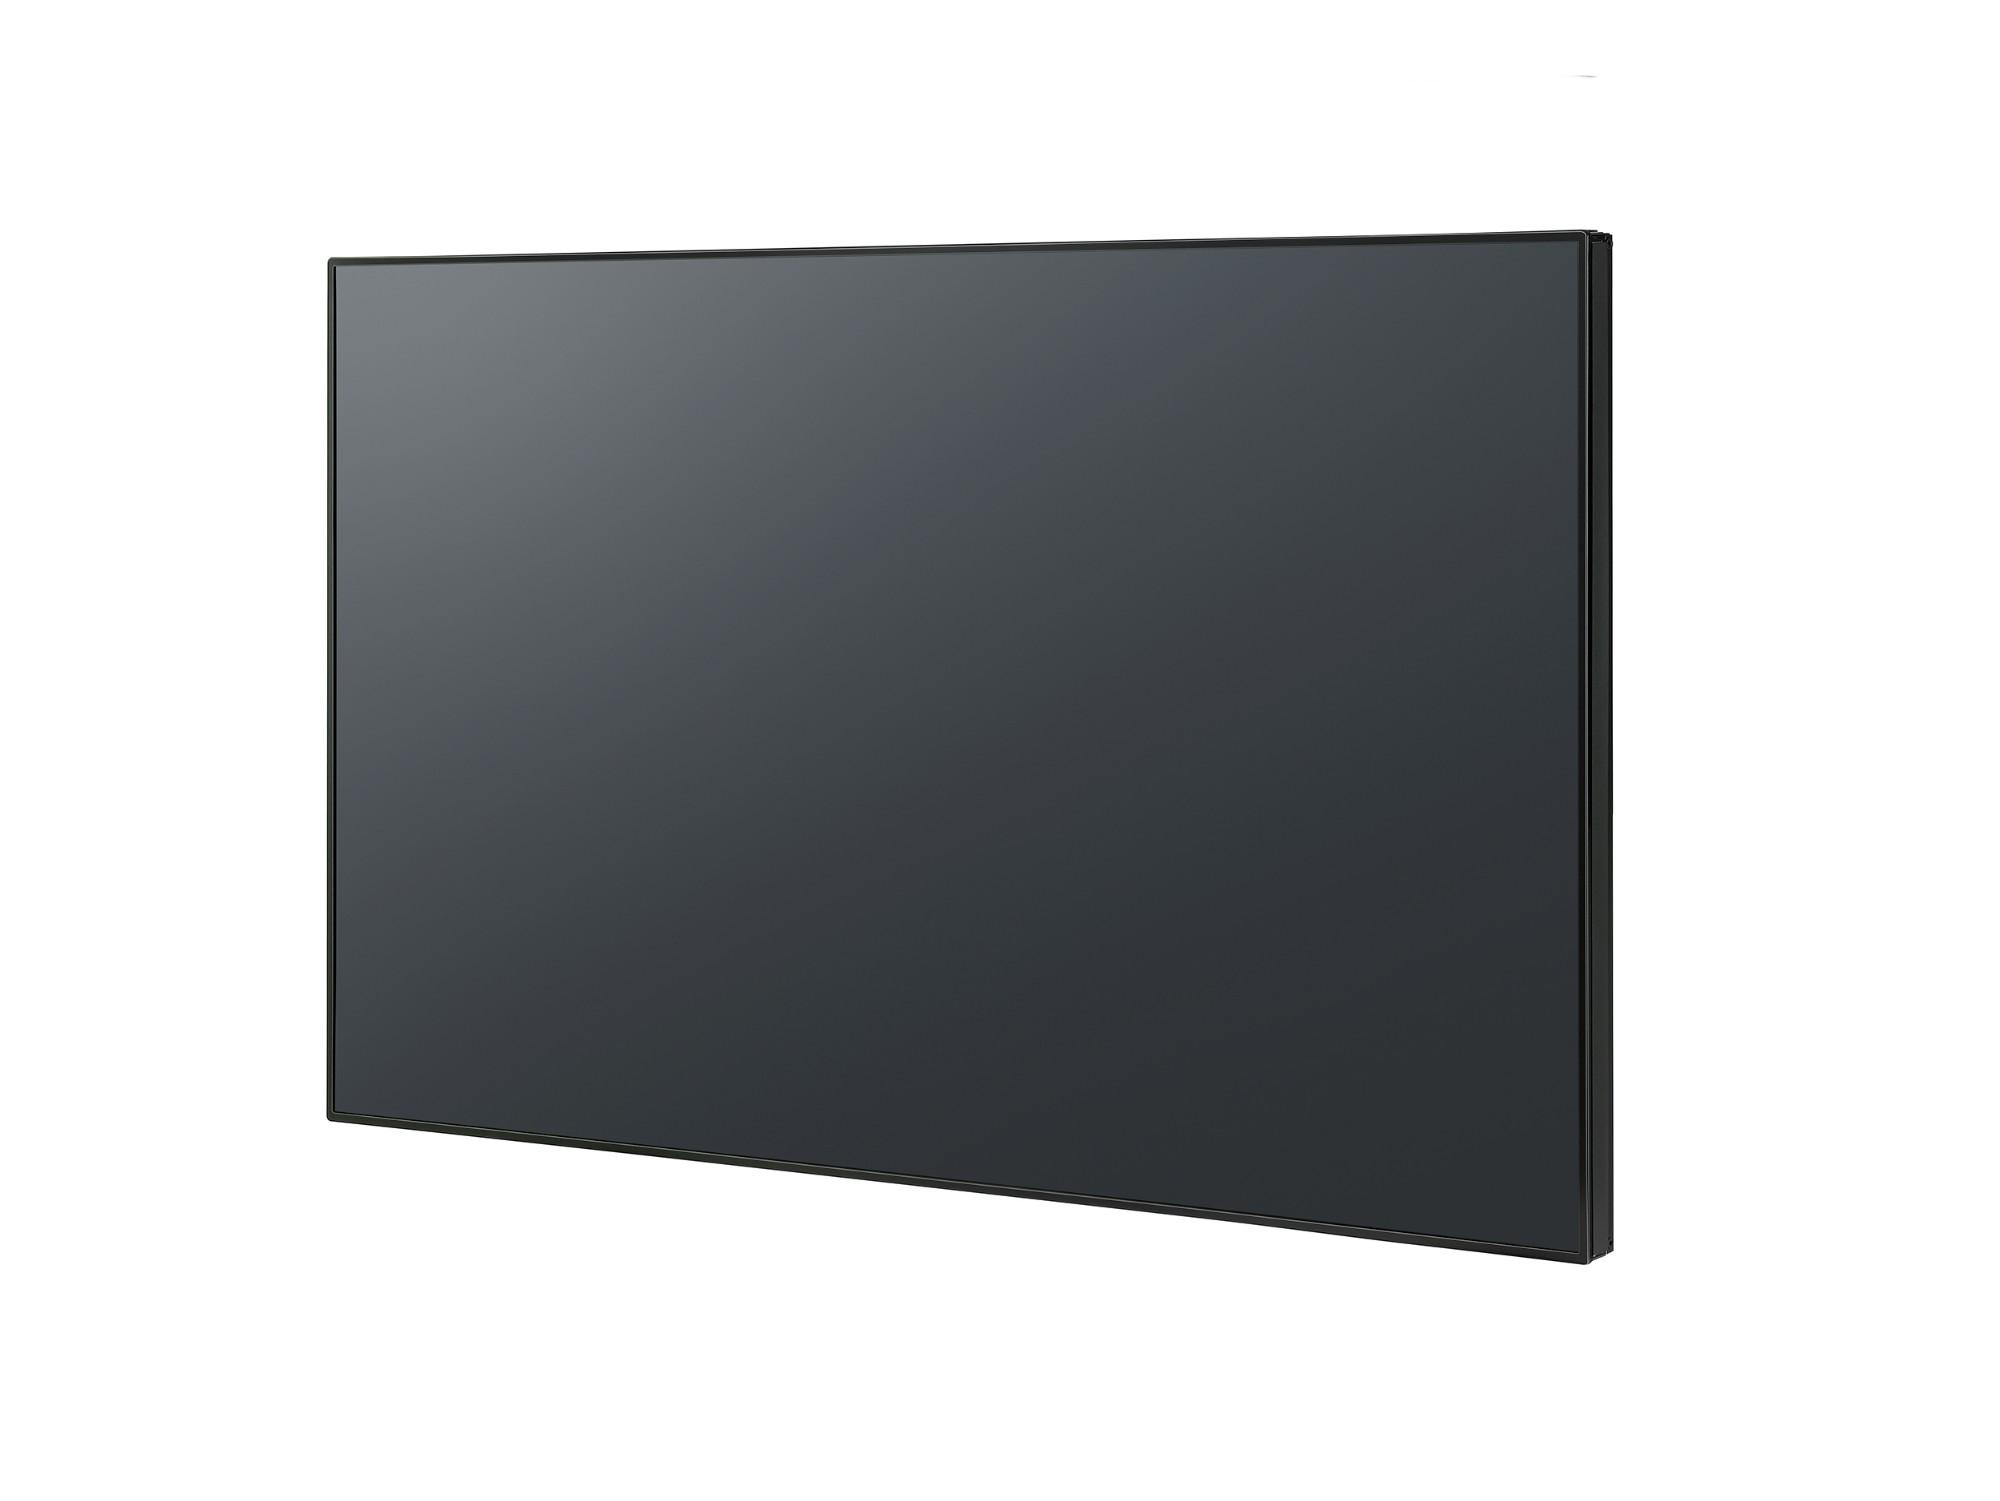 "Panasonic TH-42LF80W Digital signage flat panel 42"" LCD Full HD Black signage display"